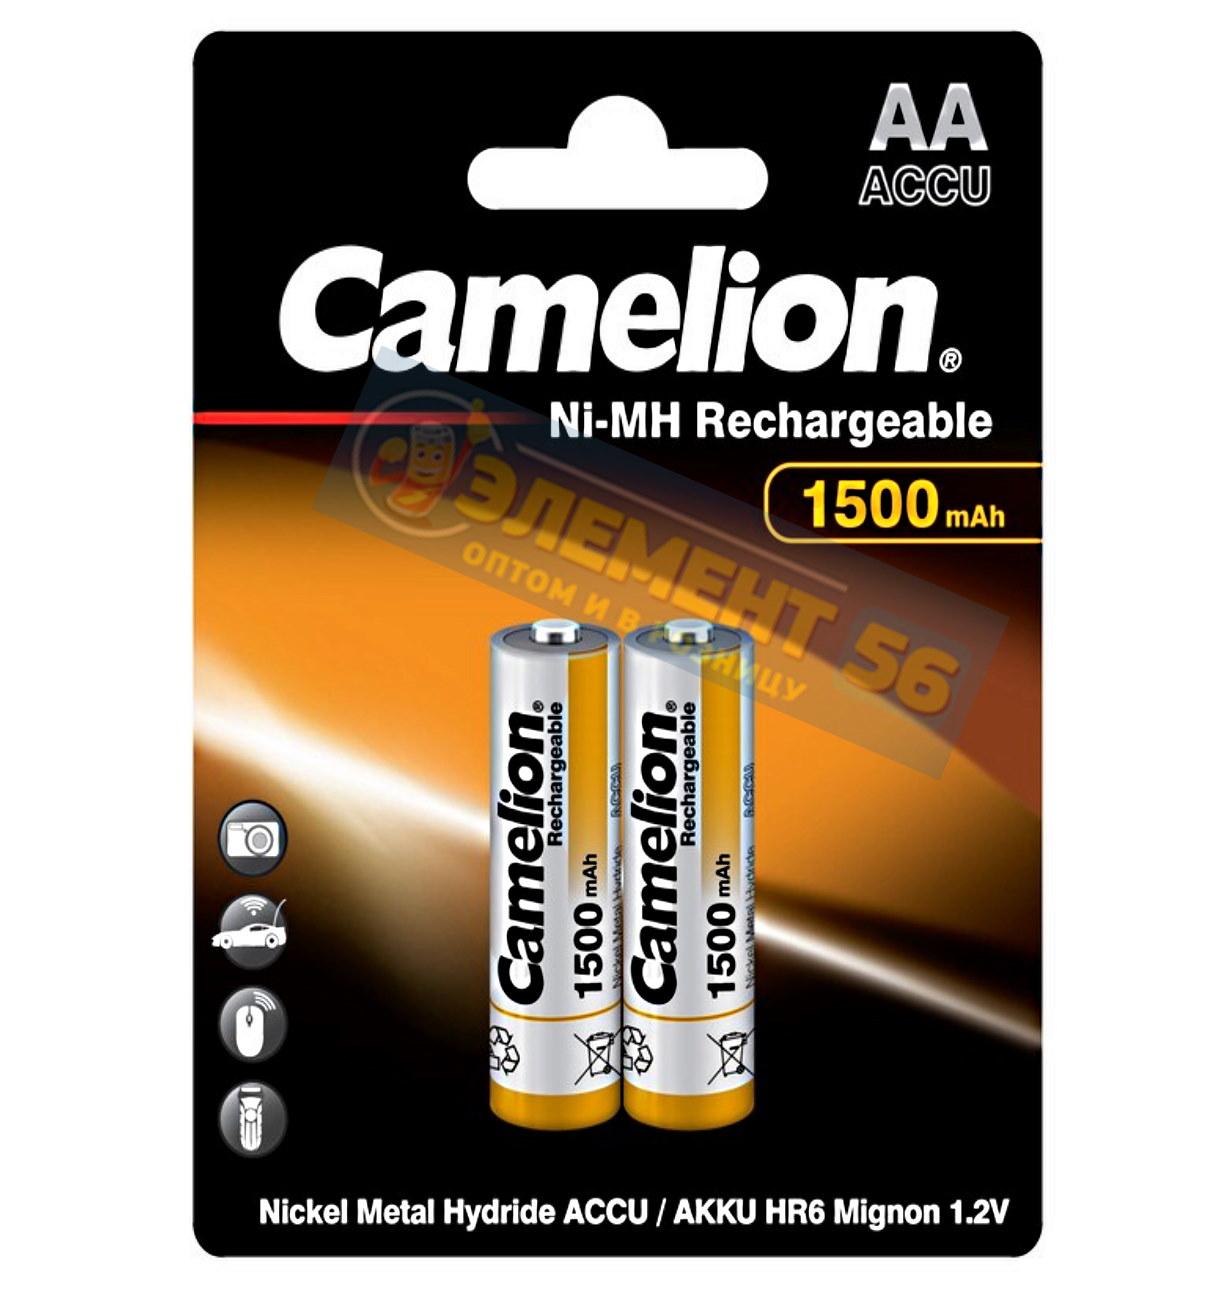 Аккумулятор CAMELION AA, HR6 (1500 mAh) MN1500, А316 2BL (2) (24) (384)